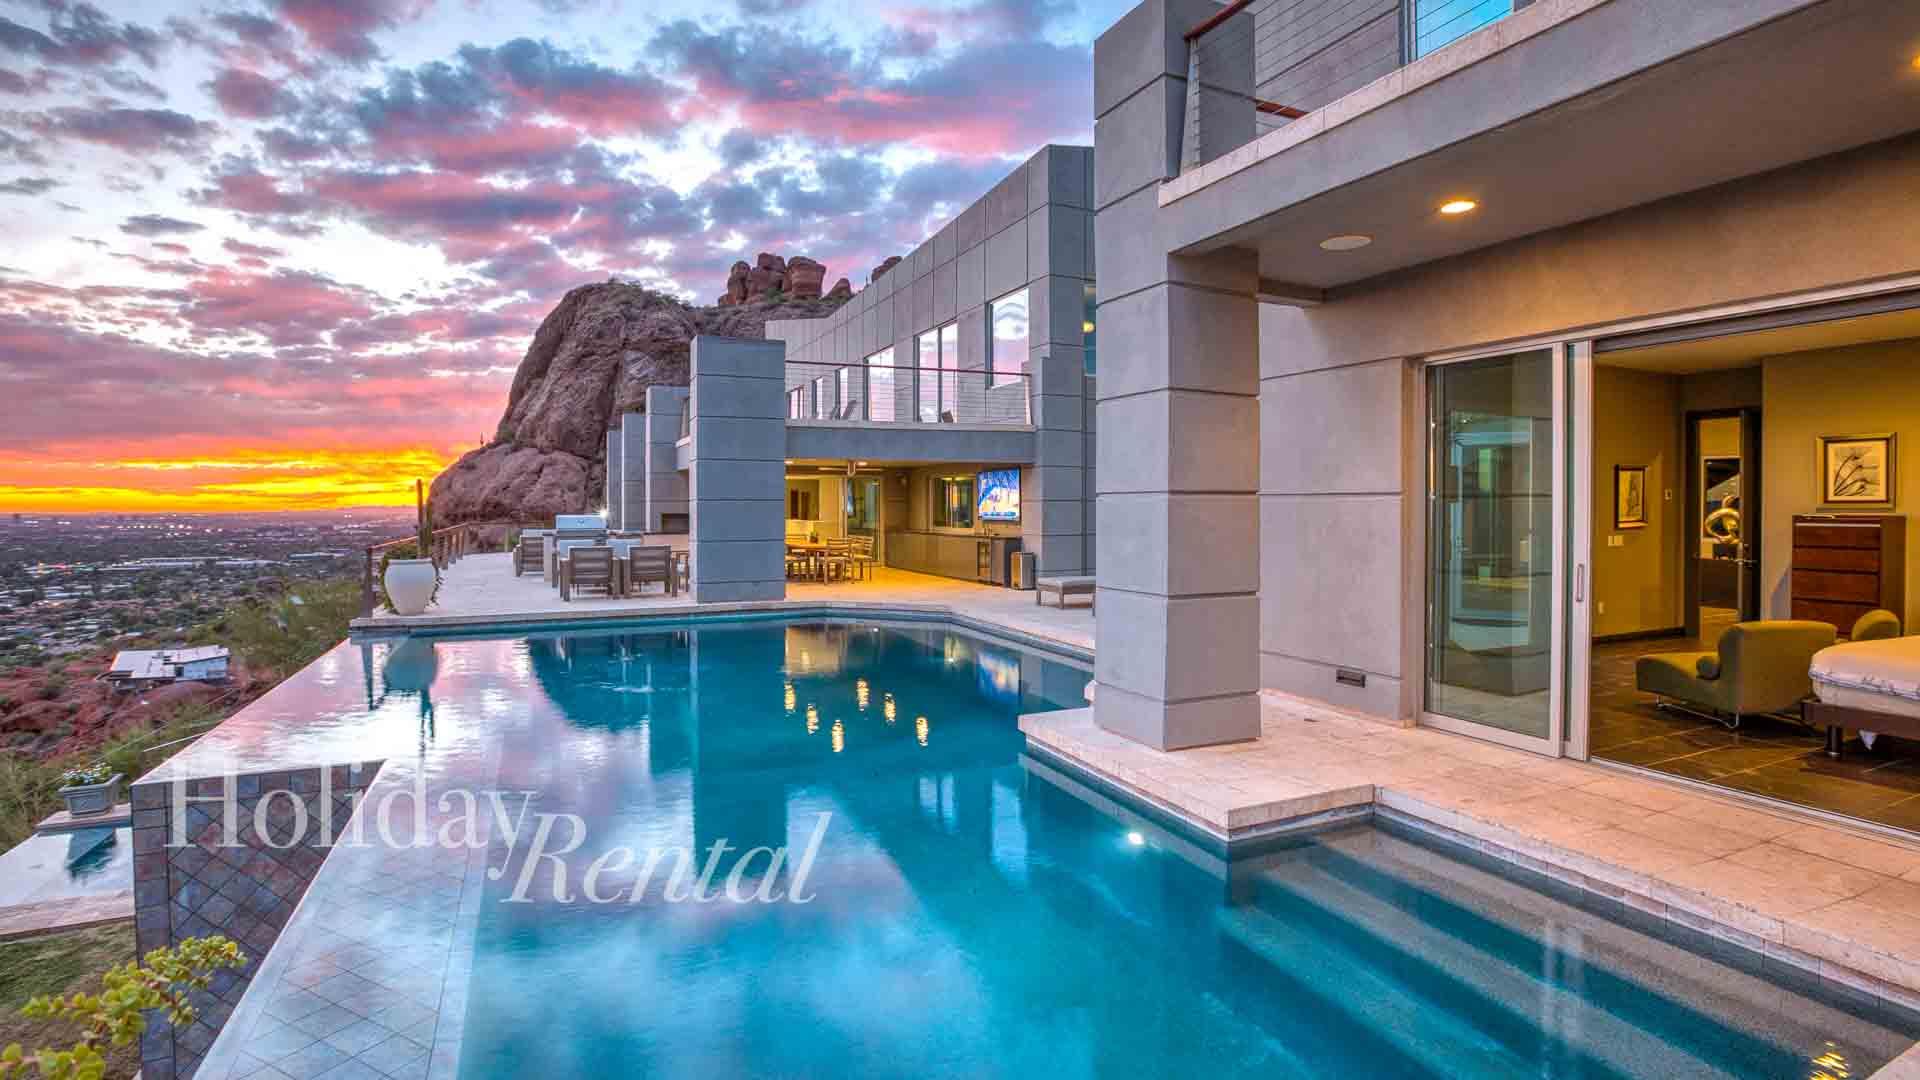 10 Million Dollar Mansion on Camelback! City Views, 8 bedroom Luxury, We are HOLIDAYRENTAL!